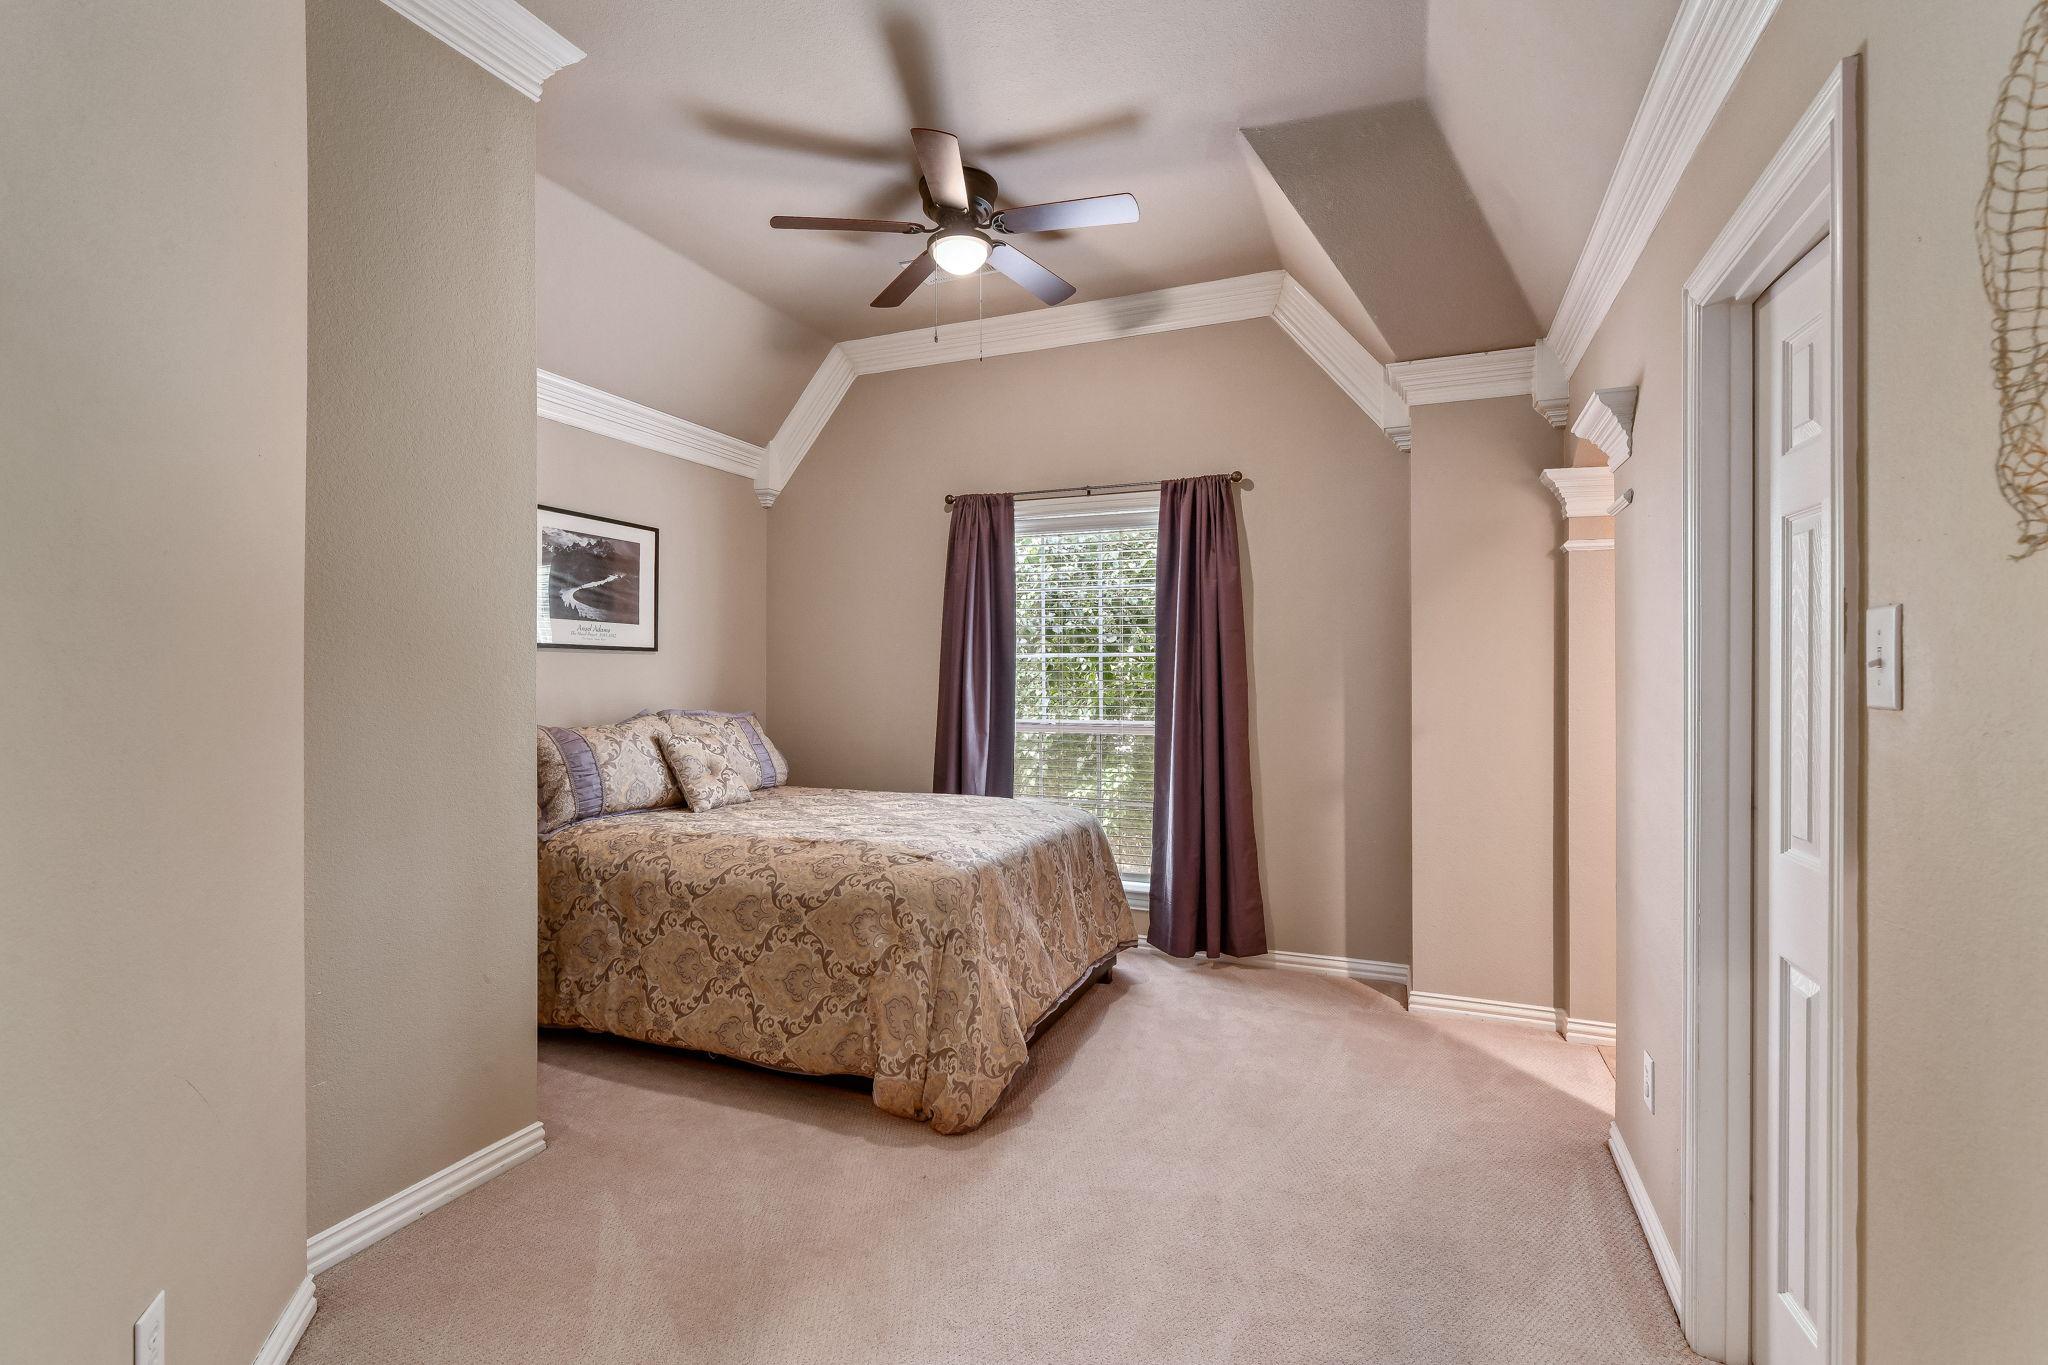 040-Bedroom 4-FULL